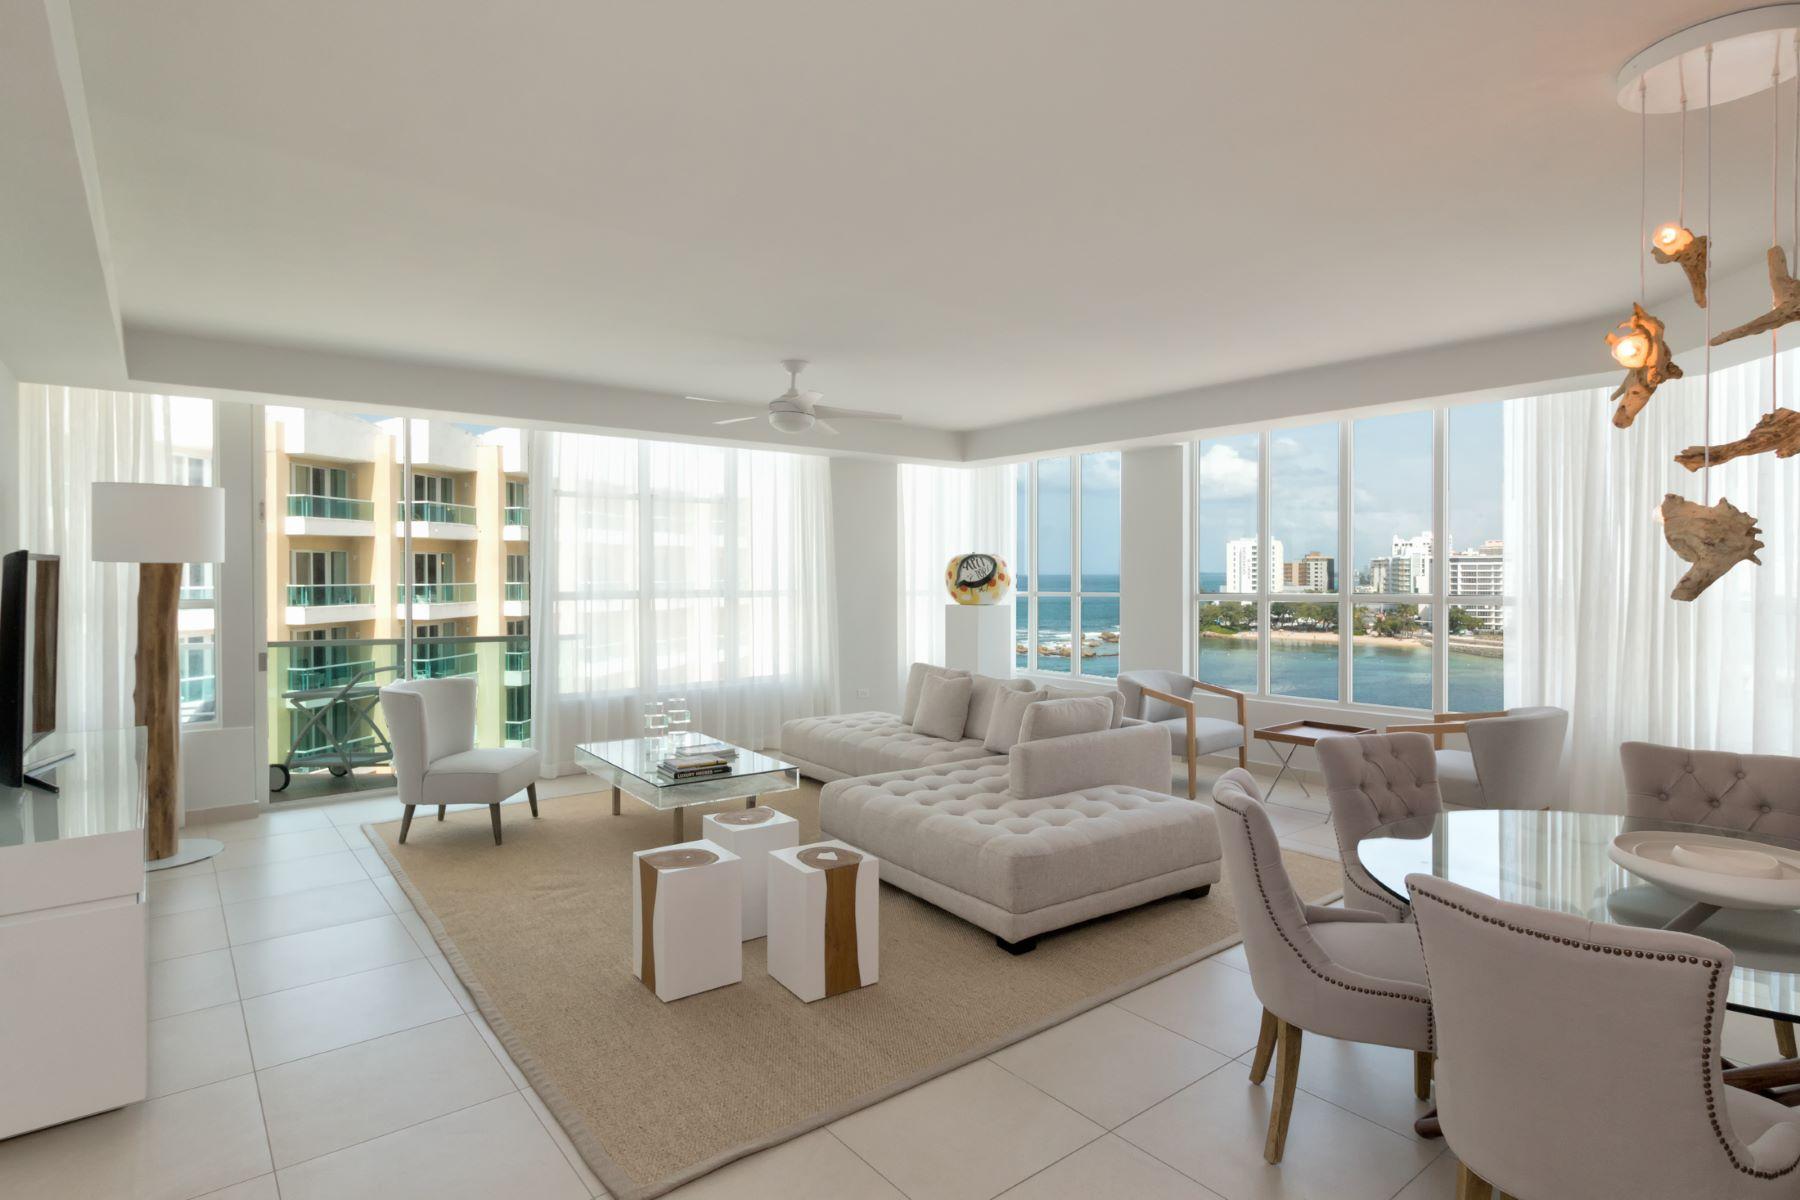 Apartment for Rent at Sought After Top Floor Apartment at Bahia Plaza 25 Muñoz Rivera Ave. Apt. 911 San Juan, Puerto Rico 00901 Puerto Rico